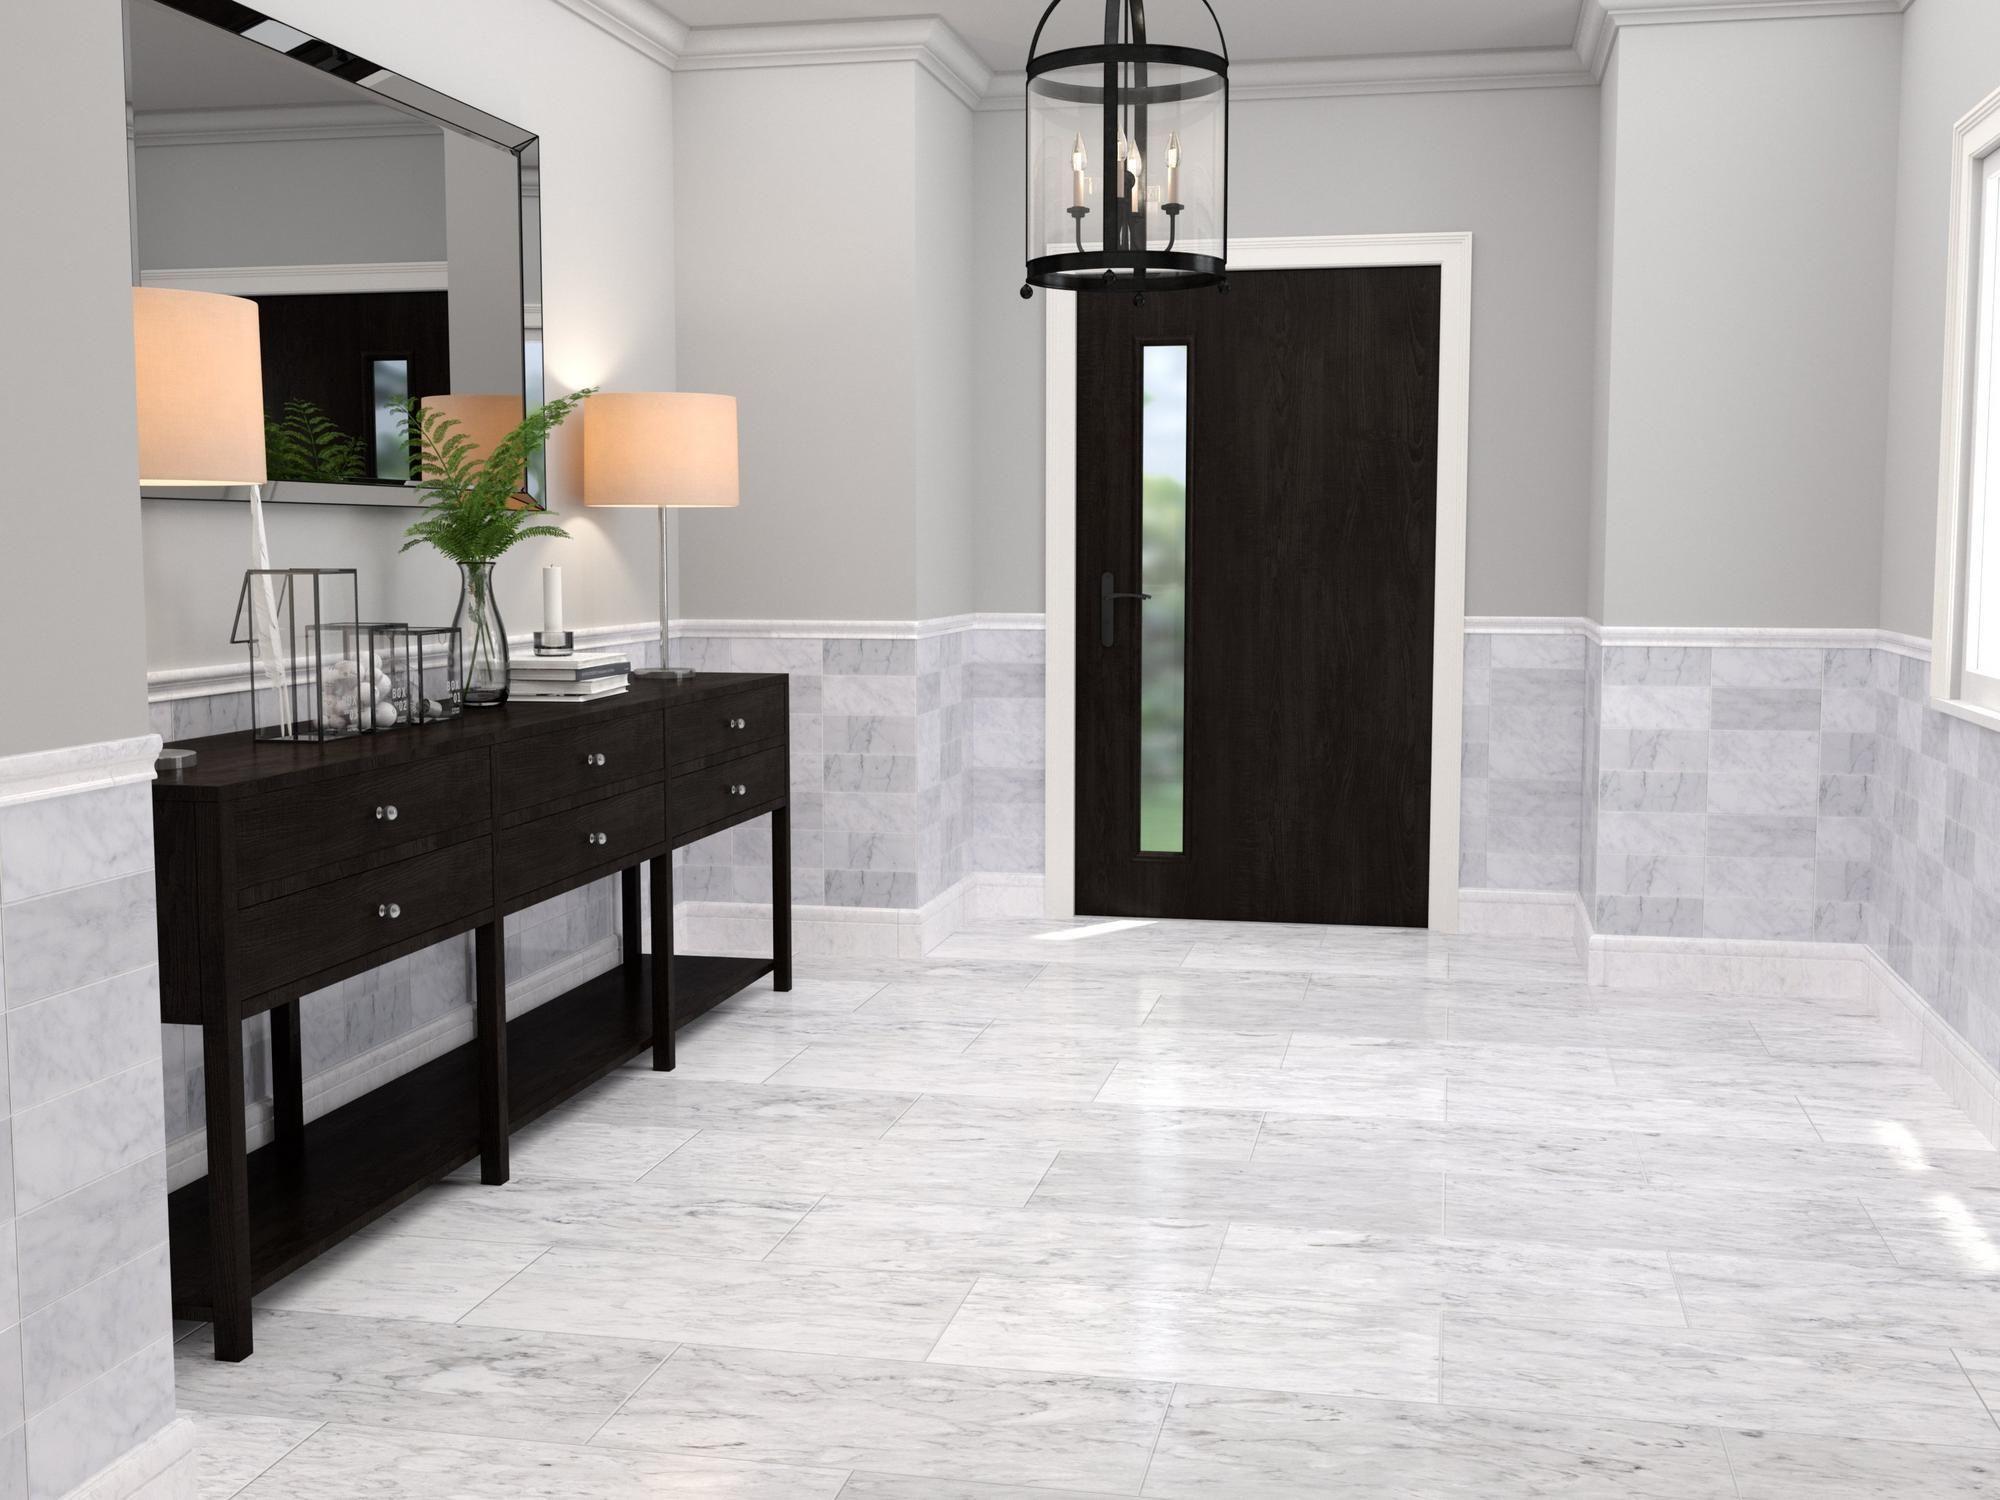 Bianco Carrara Honed Marble Tile Floor Decor Honed Marble Tiles Honed Marble Carrara Marble Tile